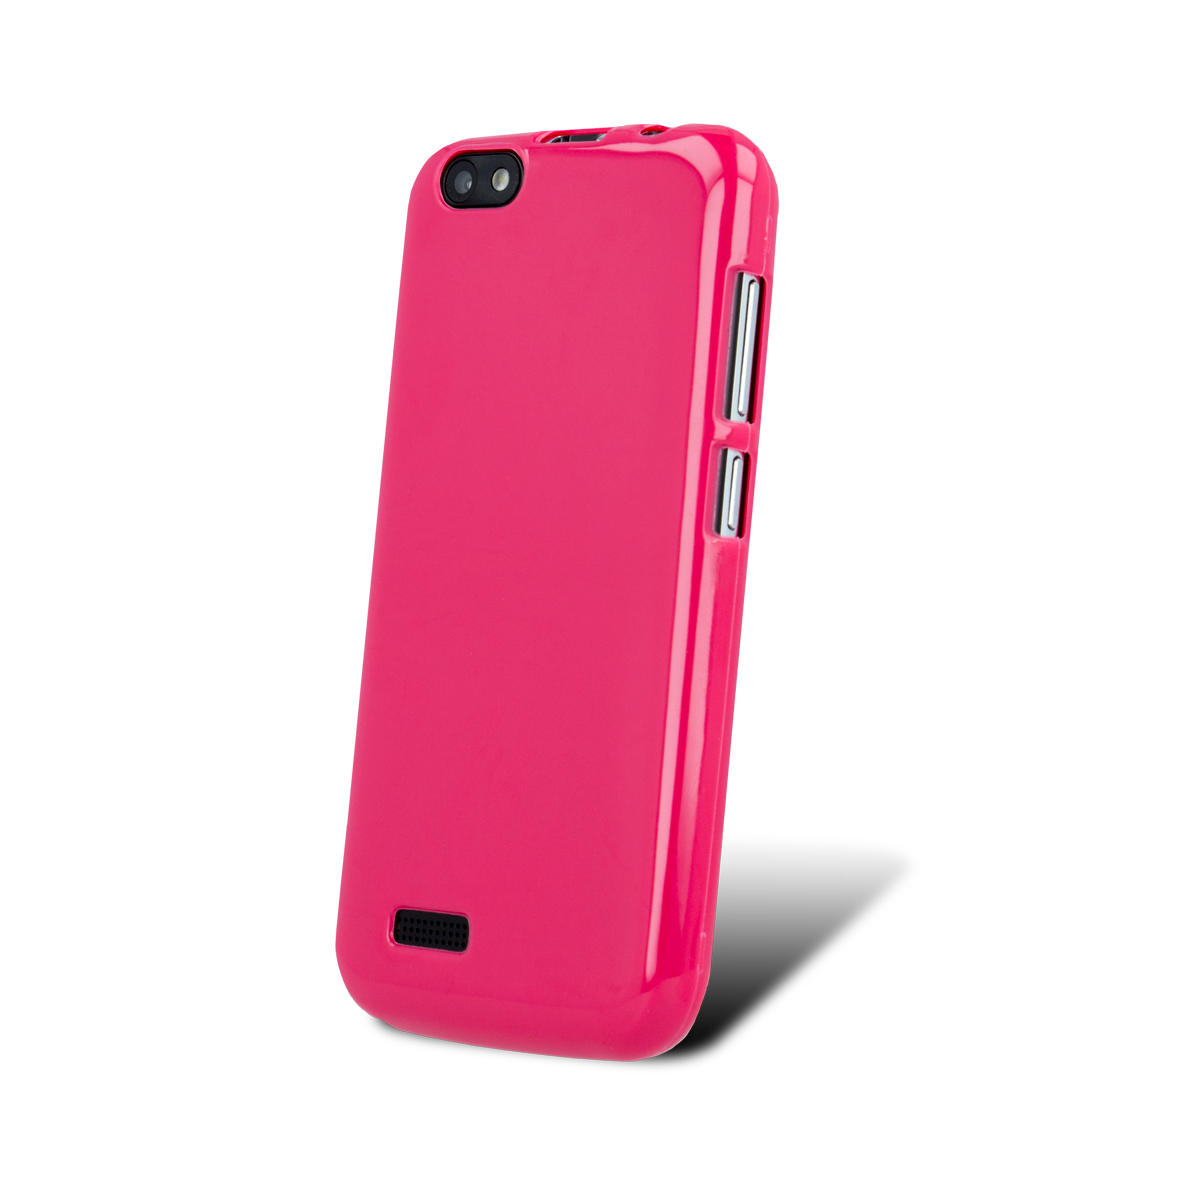 SILIKONOVÉ (TPU) POUZDRO RŮŽOVÉ PRO myPhone POCKET 2